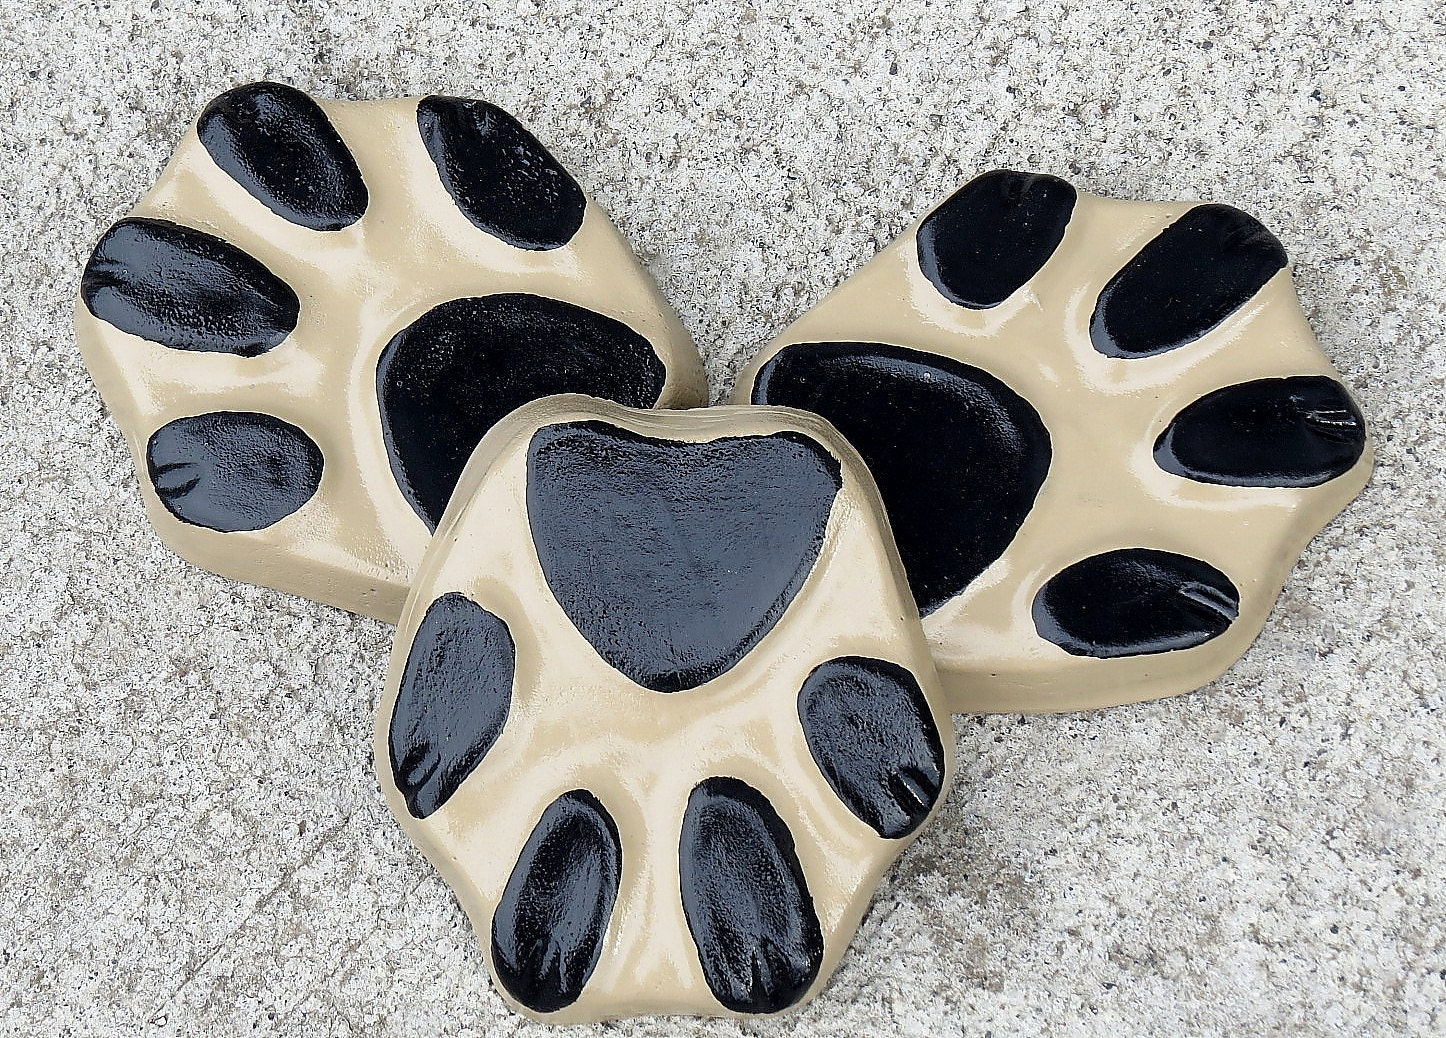 Dog Paw Print Planter Feet, Pot Feet, Dog Print, Yard Art, Patio Decor,  Black, Tan, Plant Stand